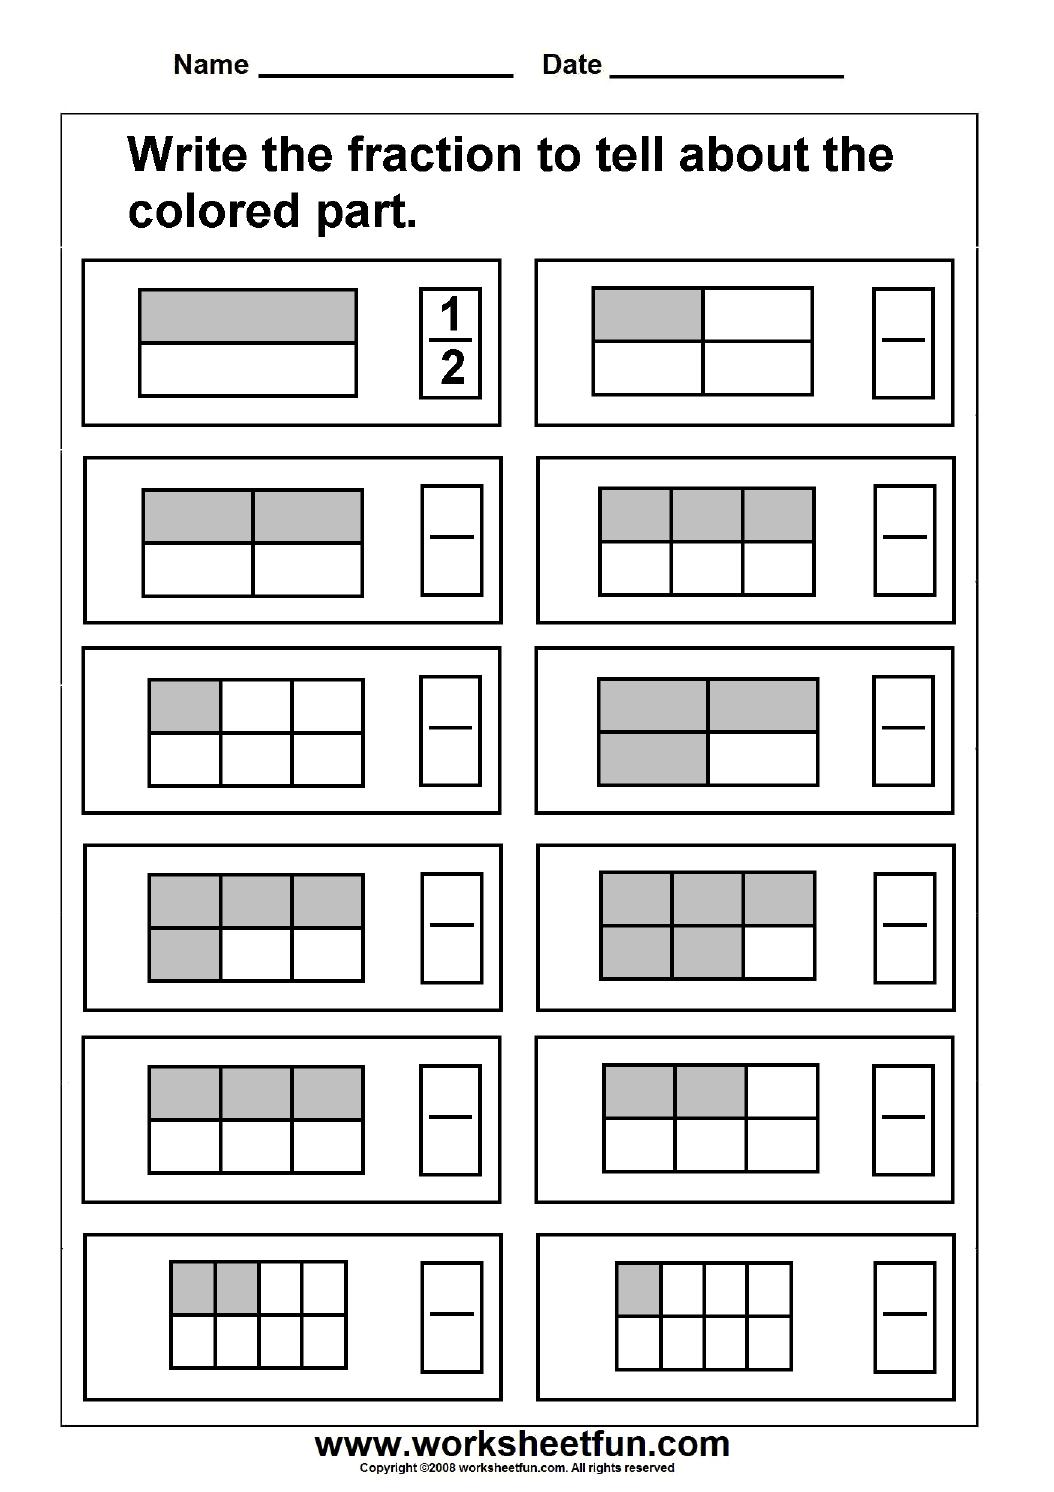 Fraction Worksheets For Grade 3 Site Pinterest Com To You Fraction Worksheets For Grade 3 3rd G Fractions Worksheets 3rd Grade Math Worksheets Learning Math